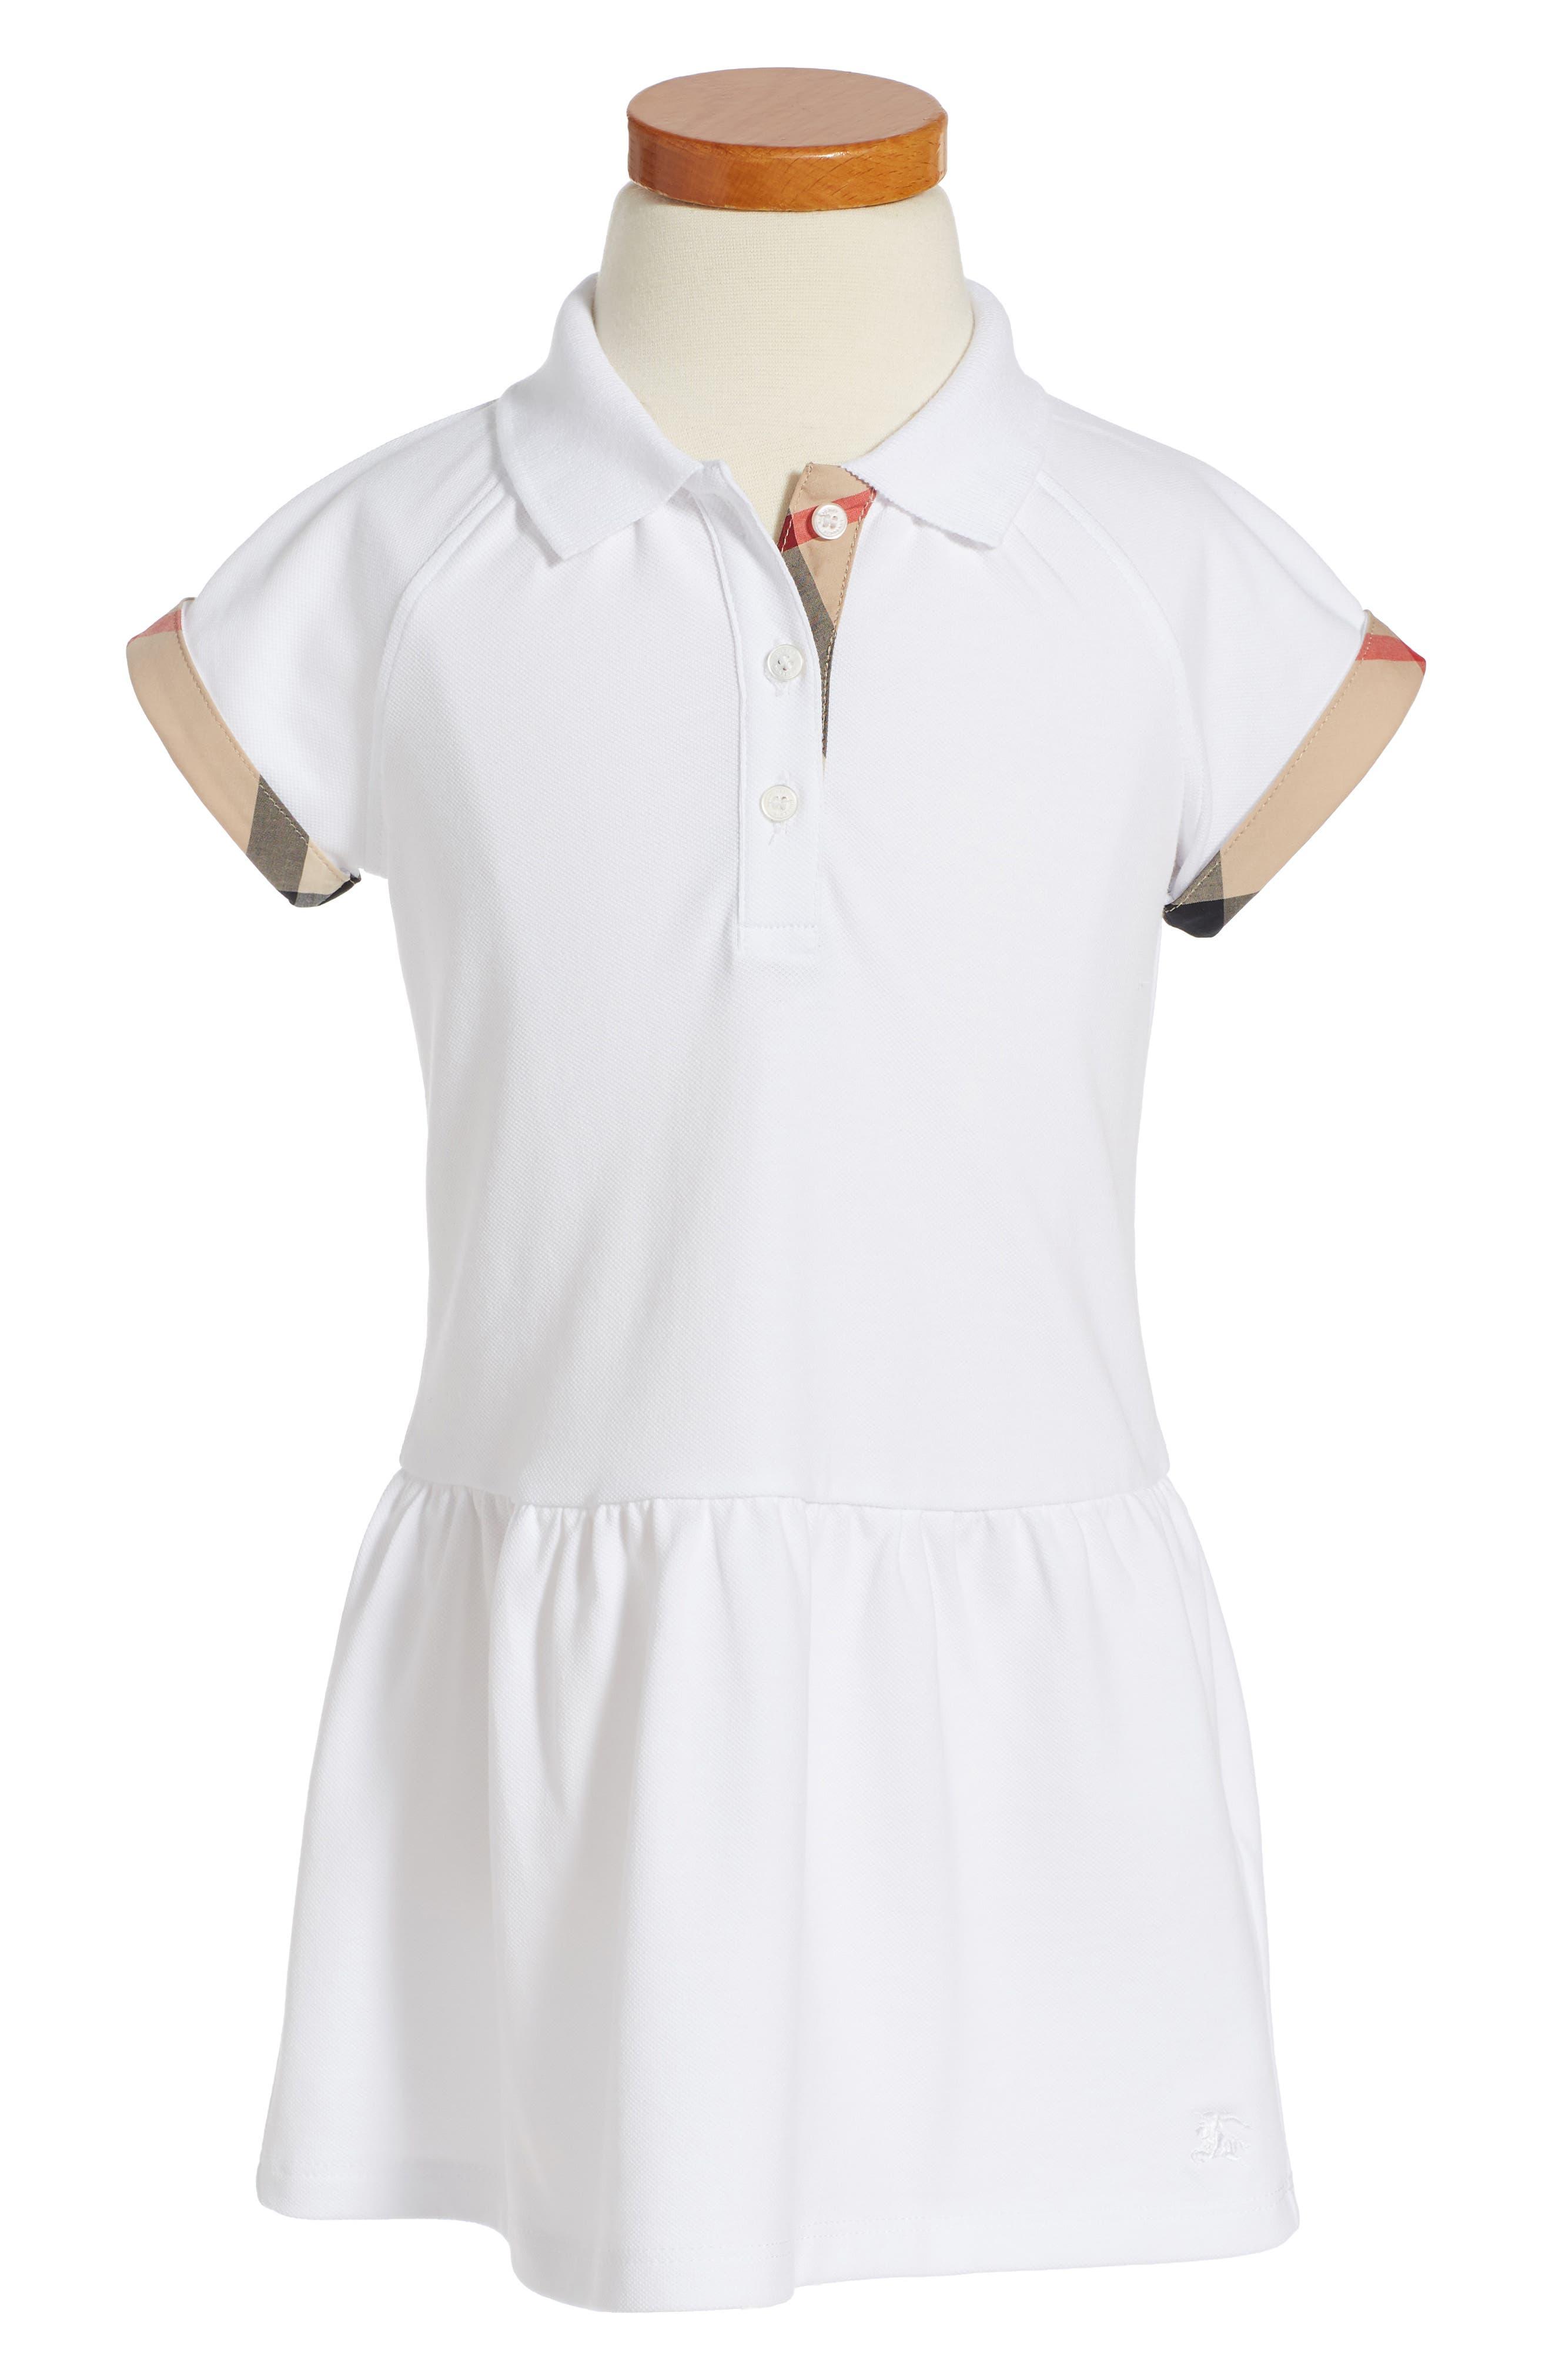 Main Image - Burberry Mini Cali Polo Dress (Toddler Girls)